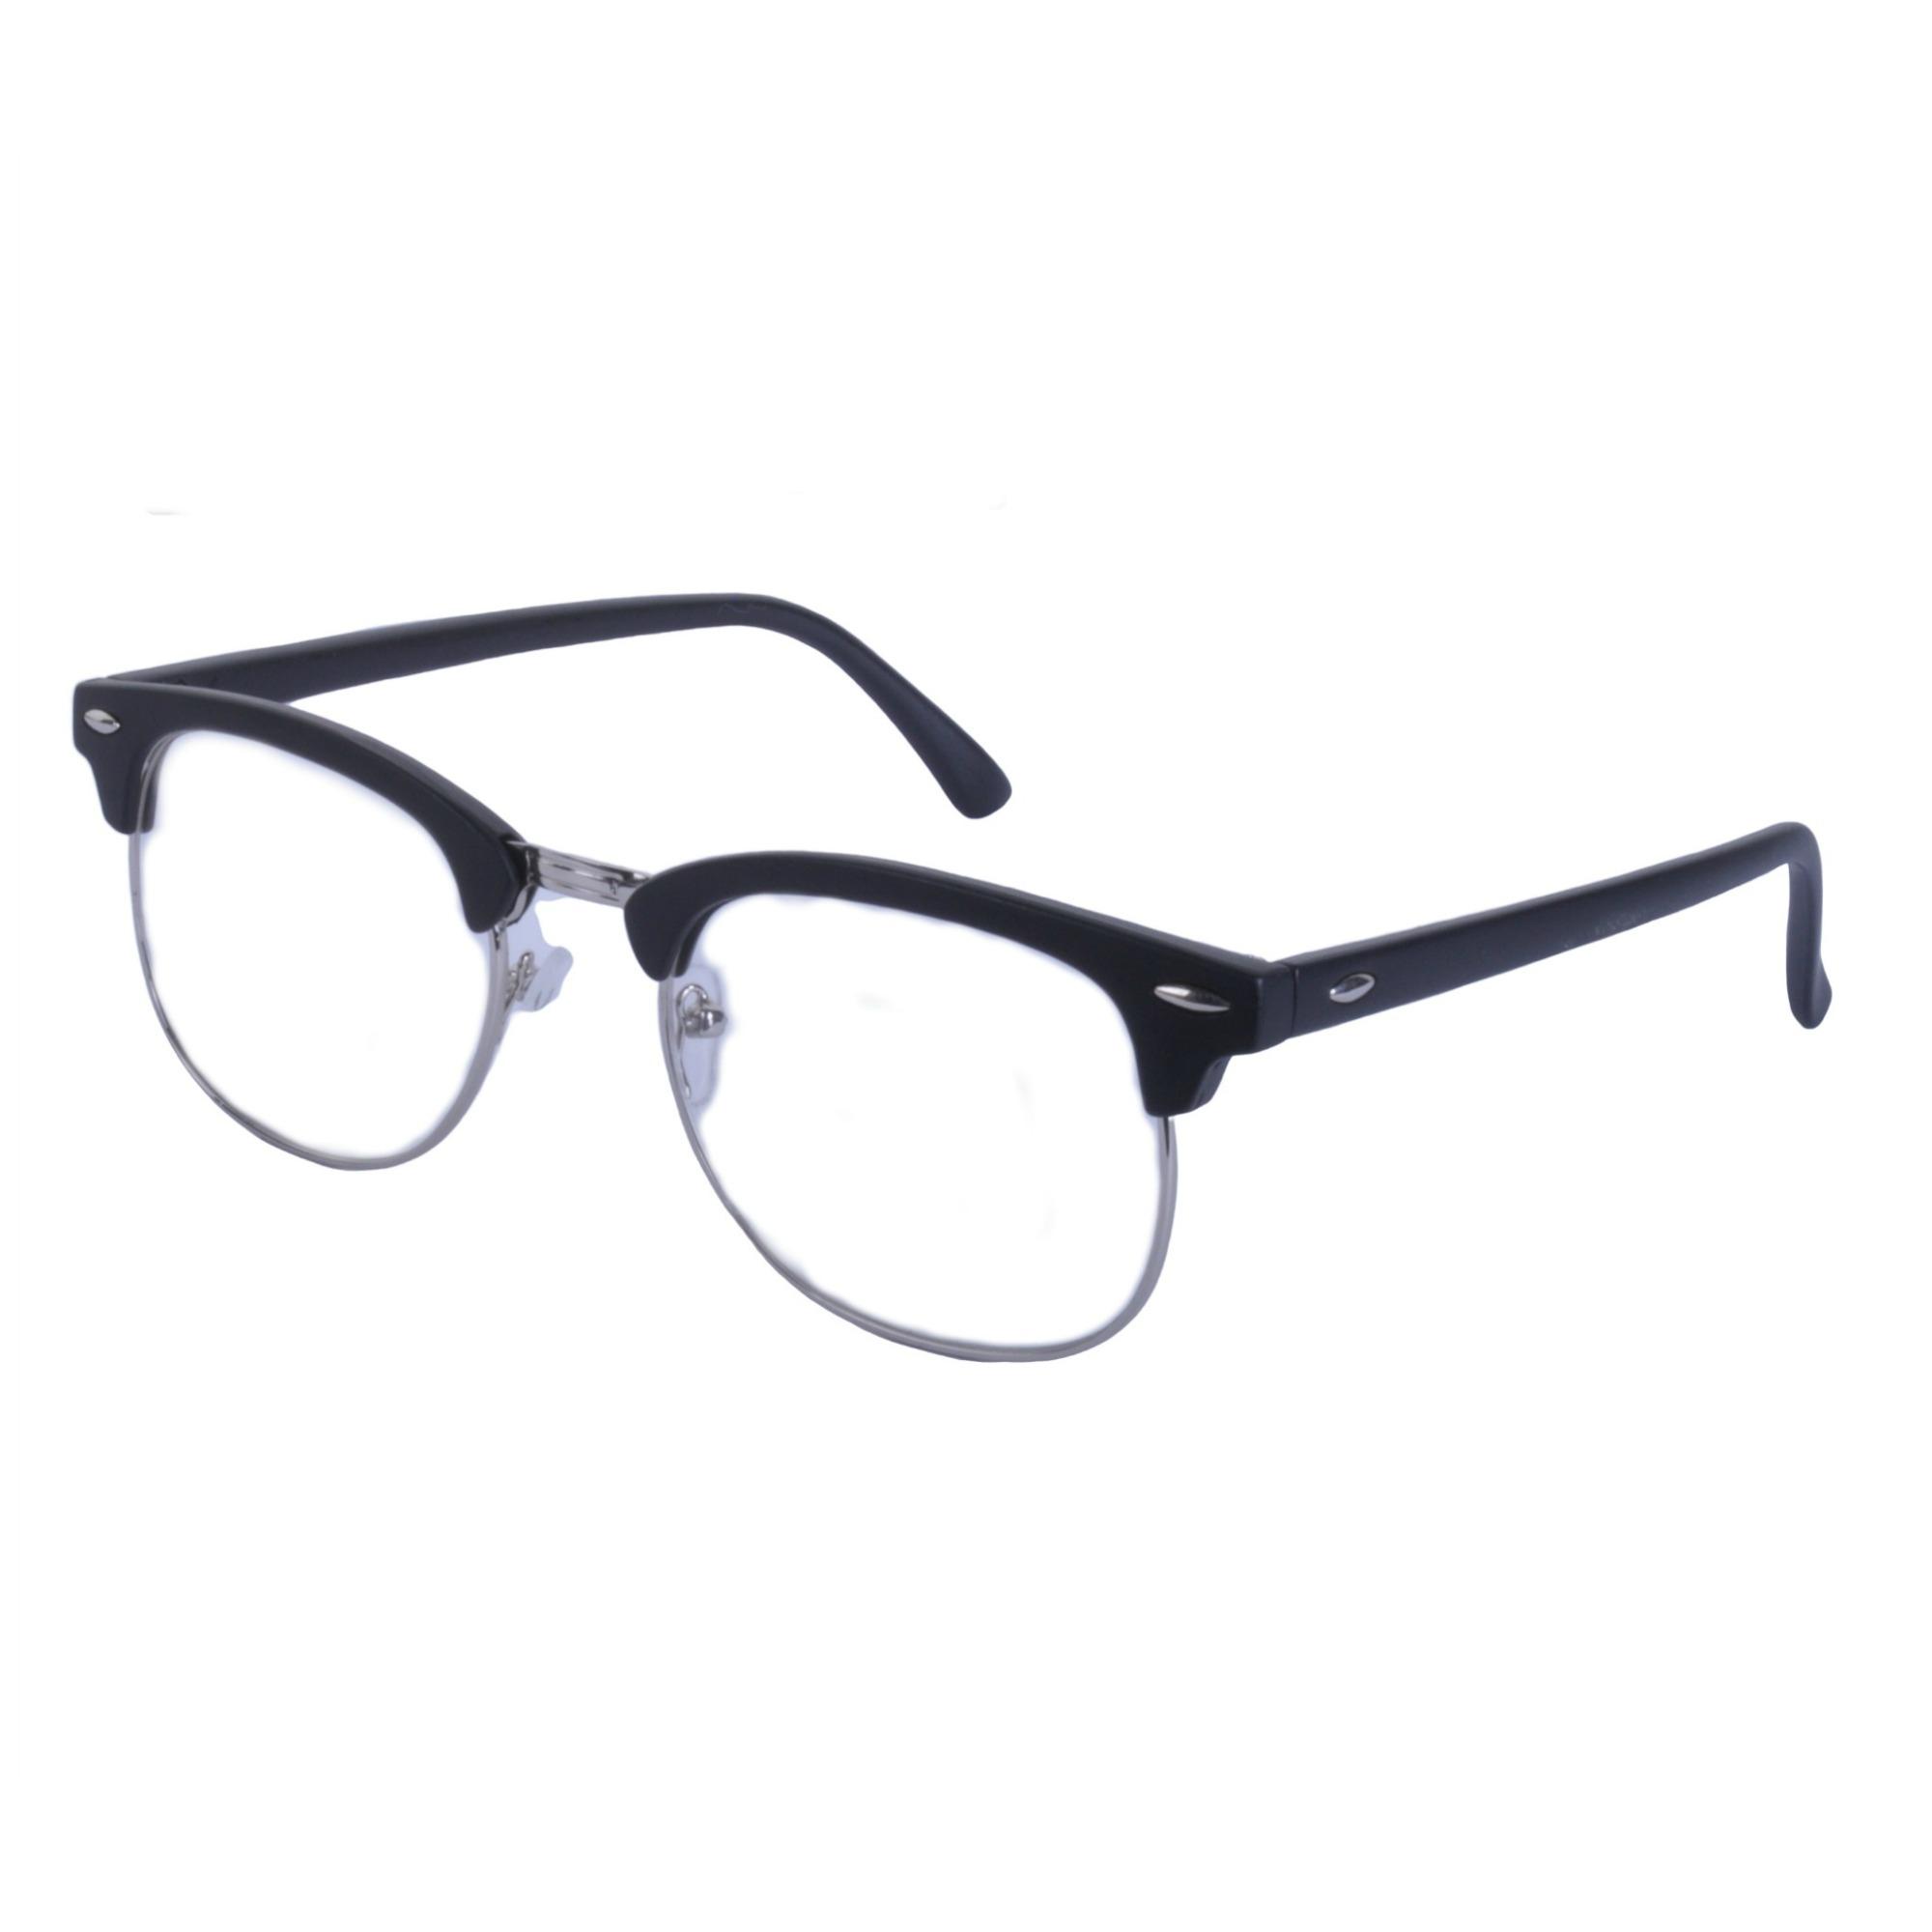 Vintage-Lente-Transparente-Cejas-Barra-Gafas-Gafas-de-Sol-Hron-Borde-Negro miniatura 8